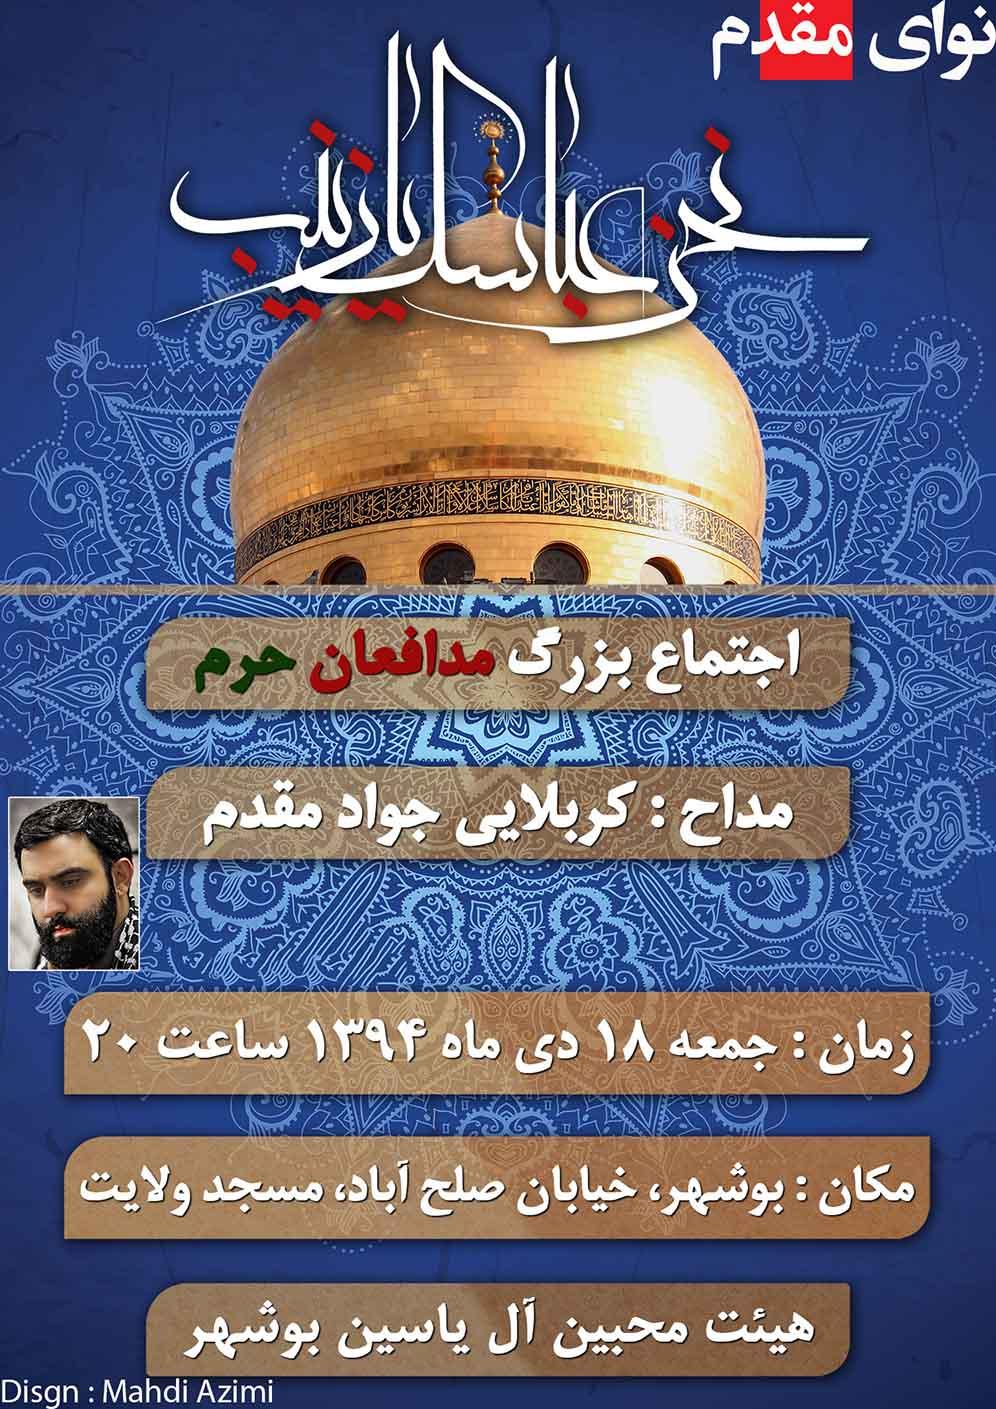 http://bayanbox.ir/view/3160711342947756240/Moghadam.ModafeanHaram.94.Bushehr-Etelaeih.jpg